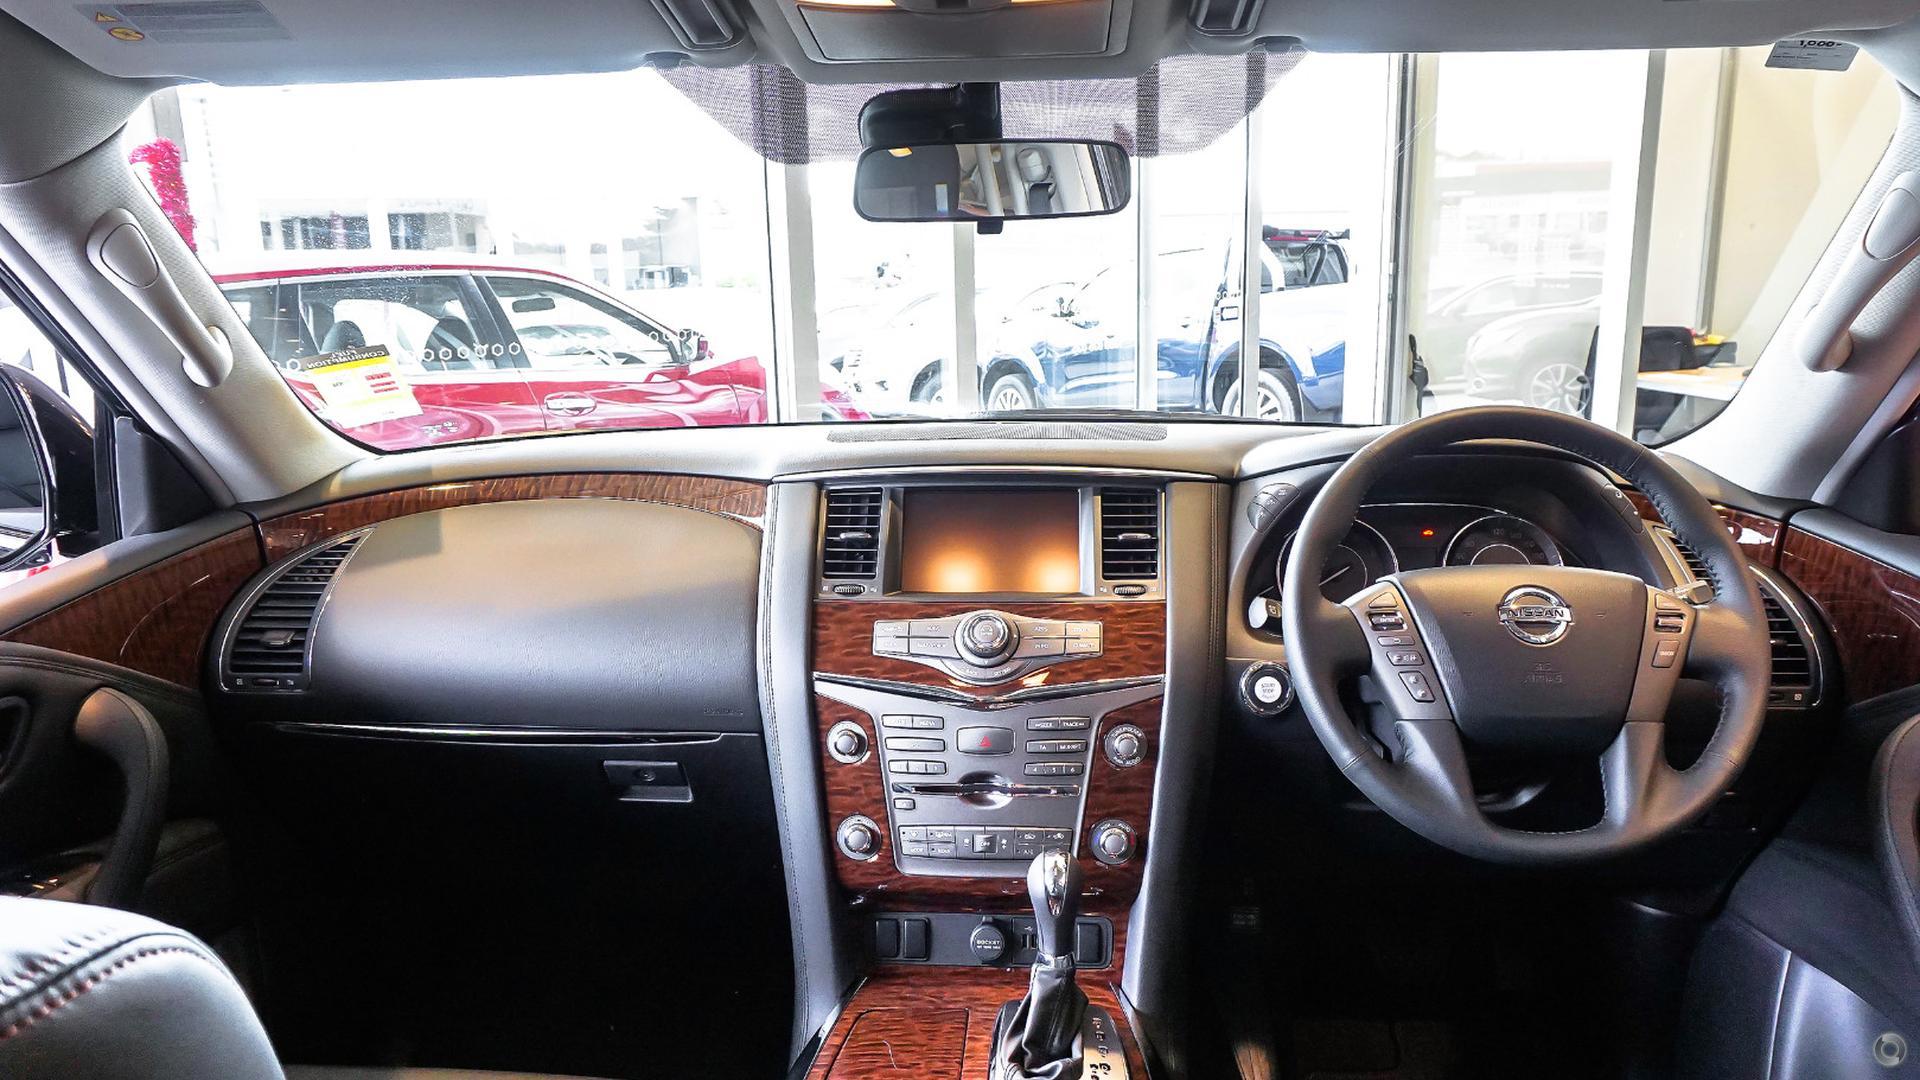 2017 Nissan Patrol Ti Y62 Series 4